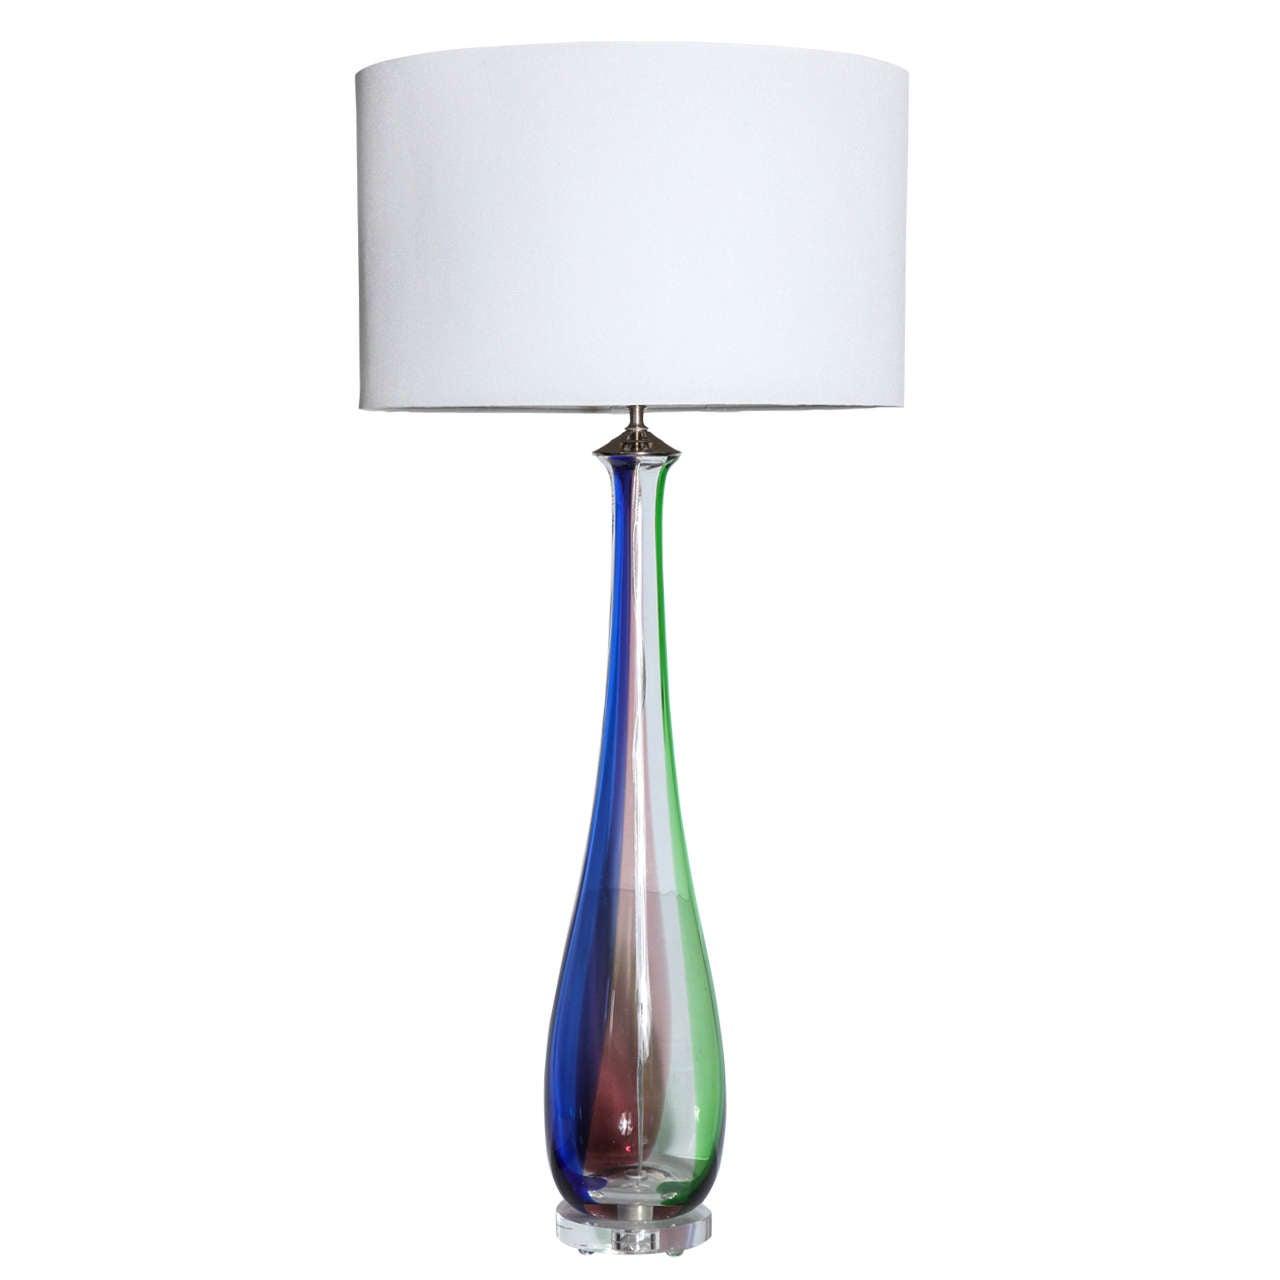 Tall Slim Lamp Table